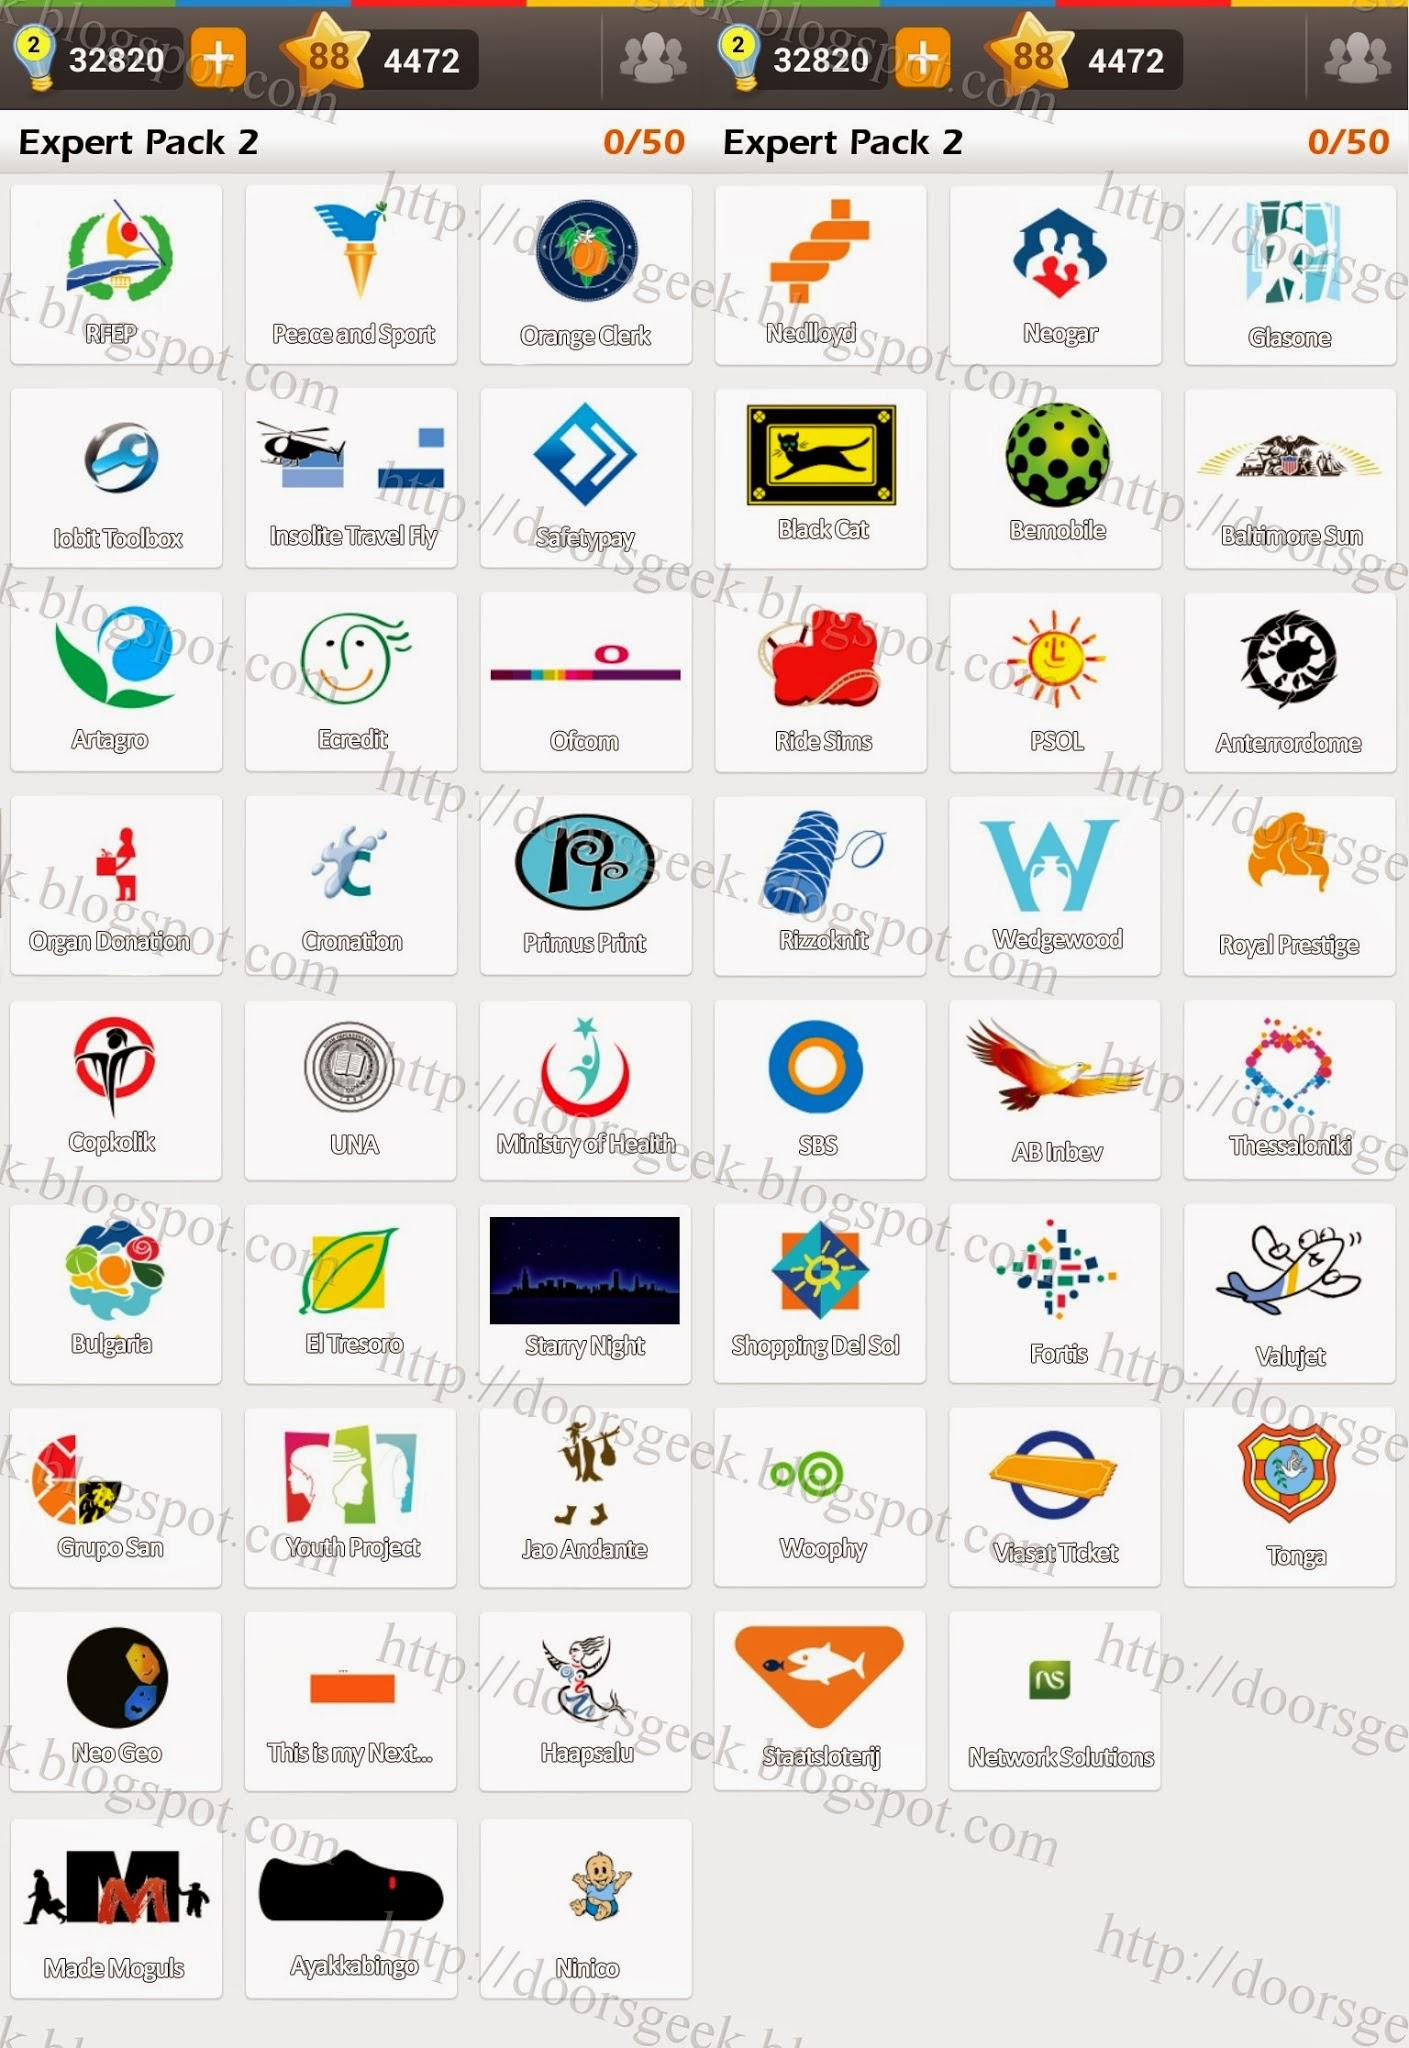 Logo game guess the brand bonus cars chainimage - Filename Logo Game Expert Pack 2 Answers Jpg